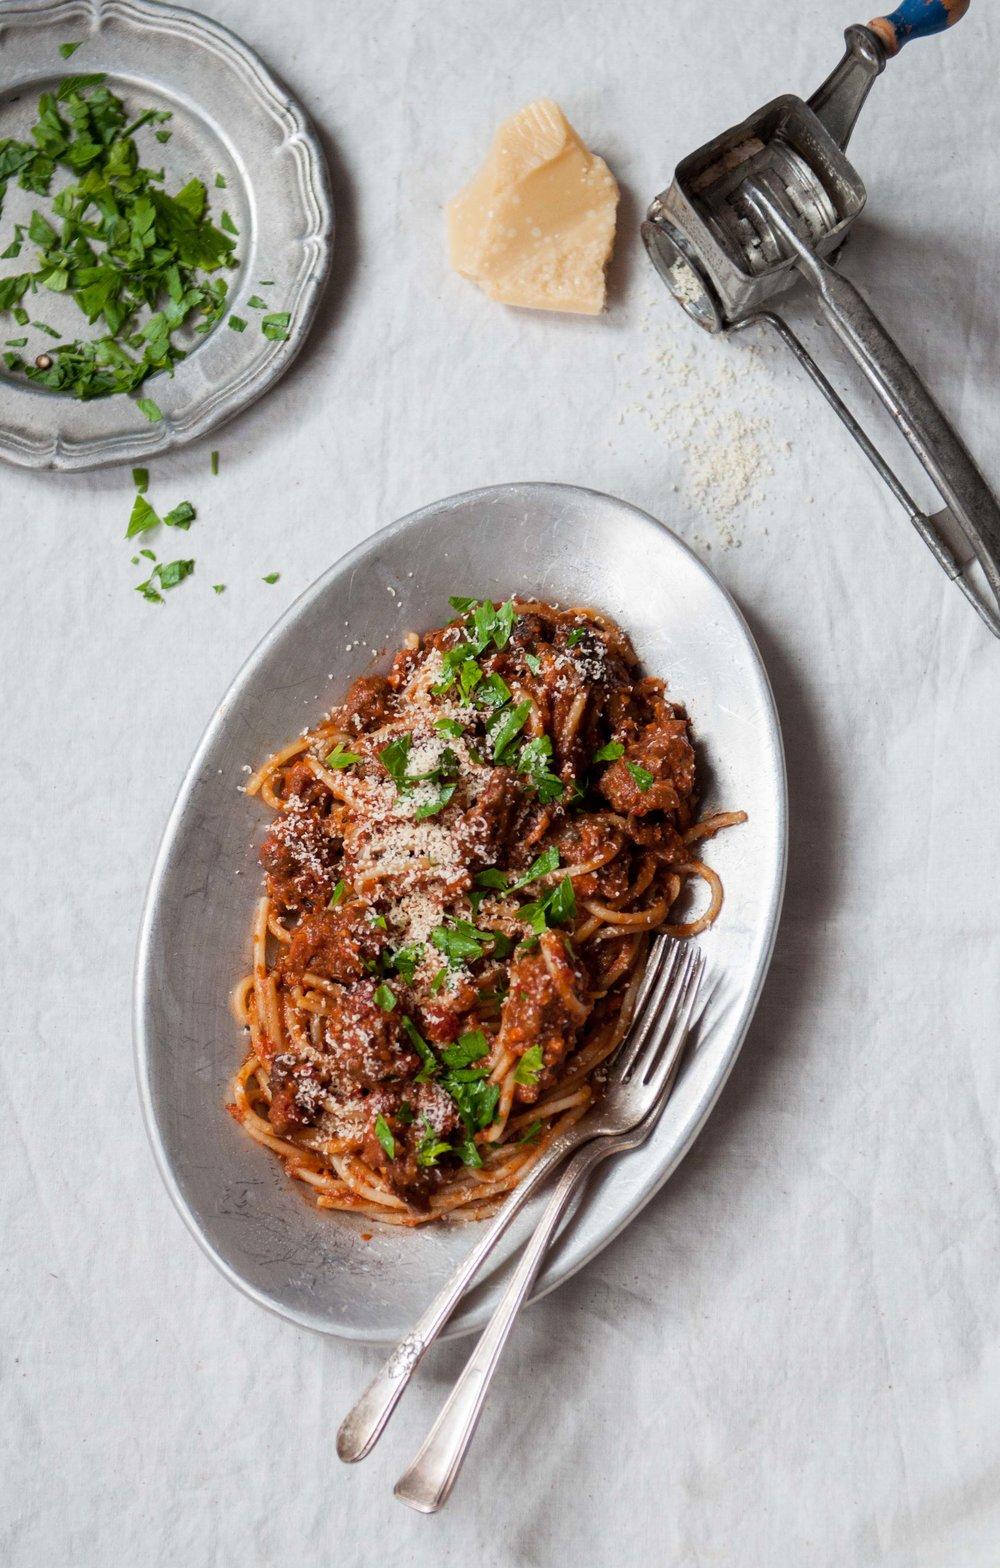 Lamb-ragu-spaghetti.jpg